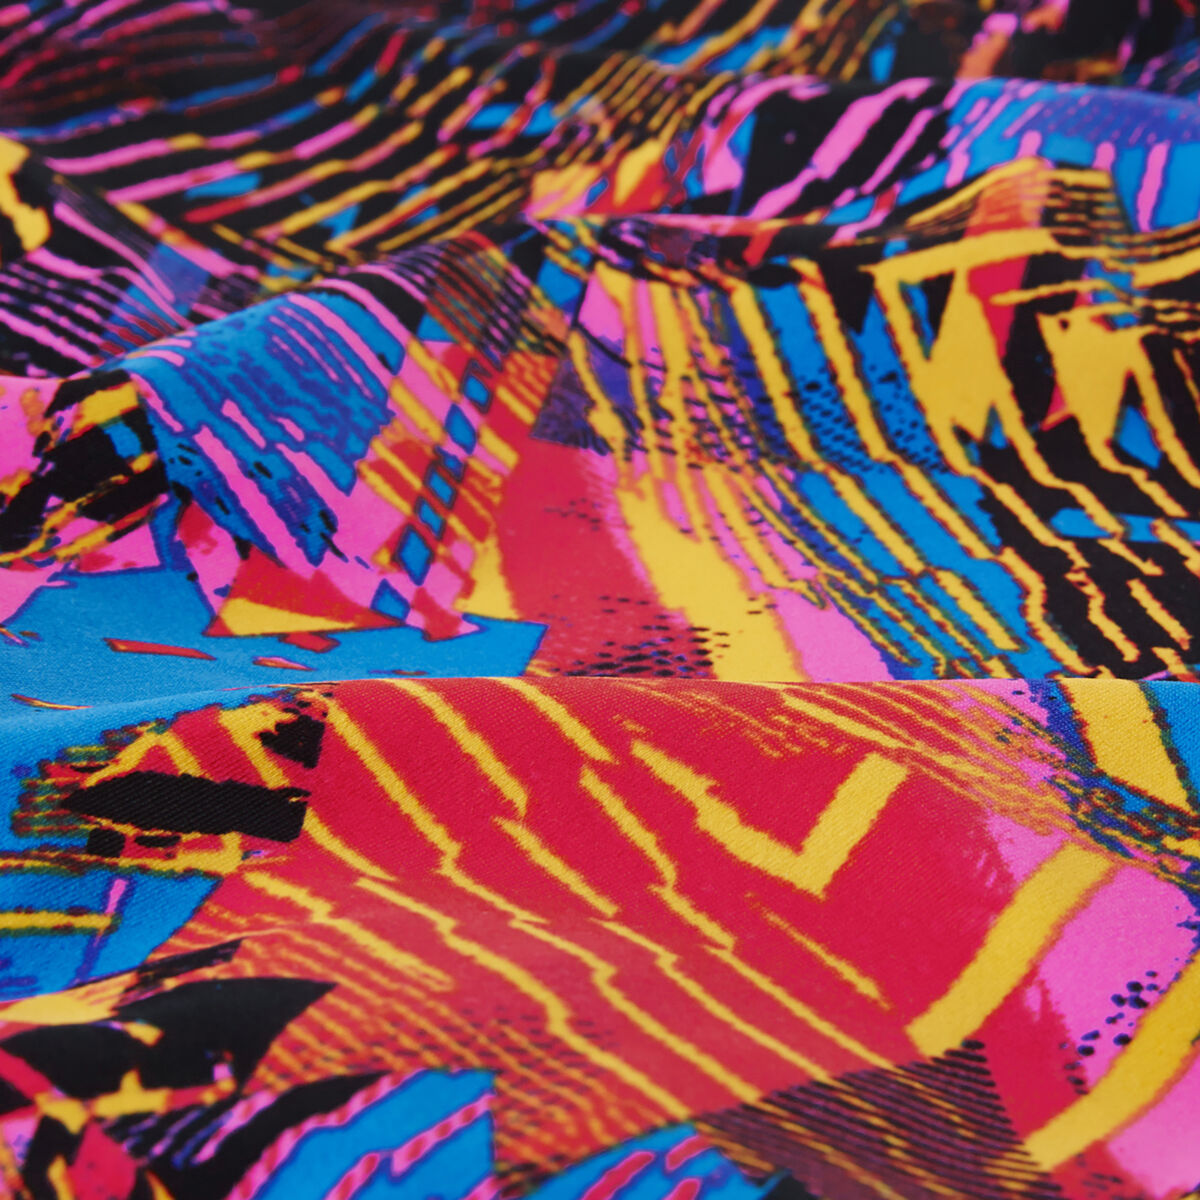 Prismstorm Rippleback Swimsuit